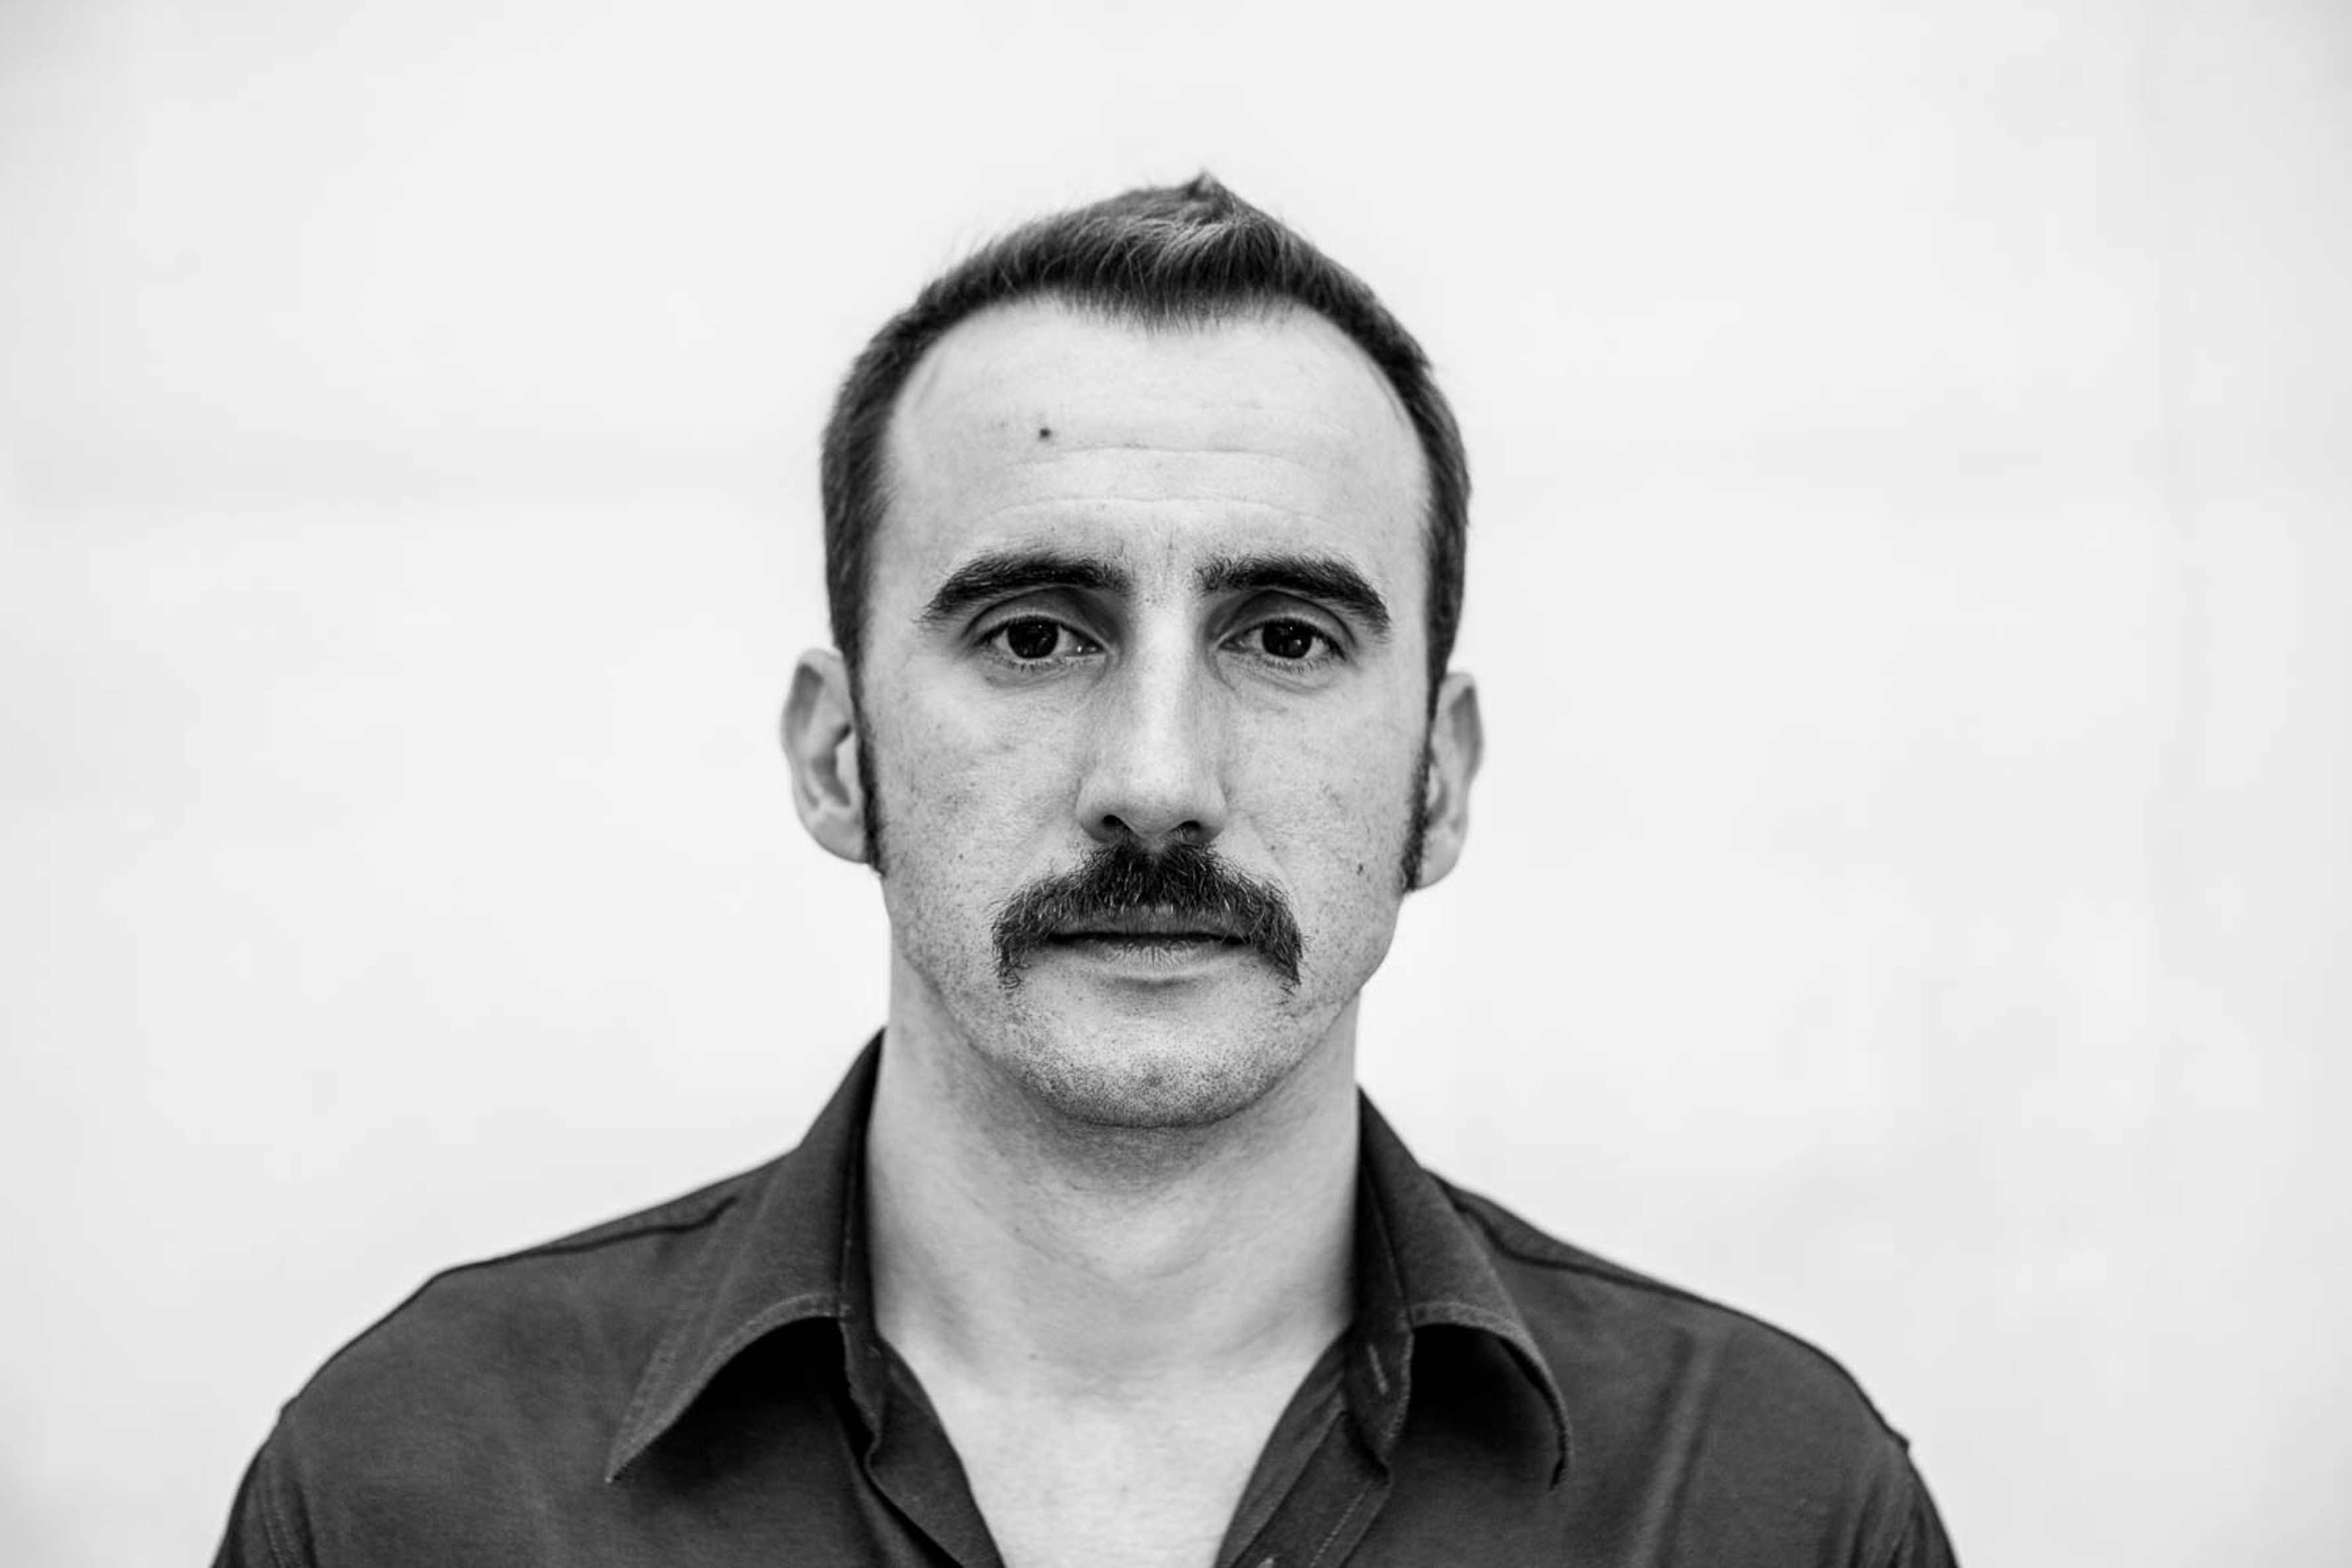 Pablo Und Destruktion presenta su primera novela